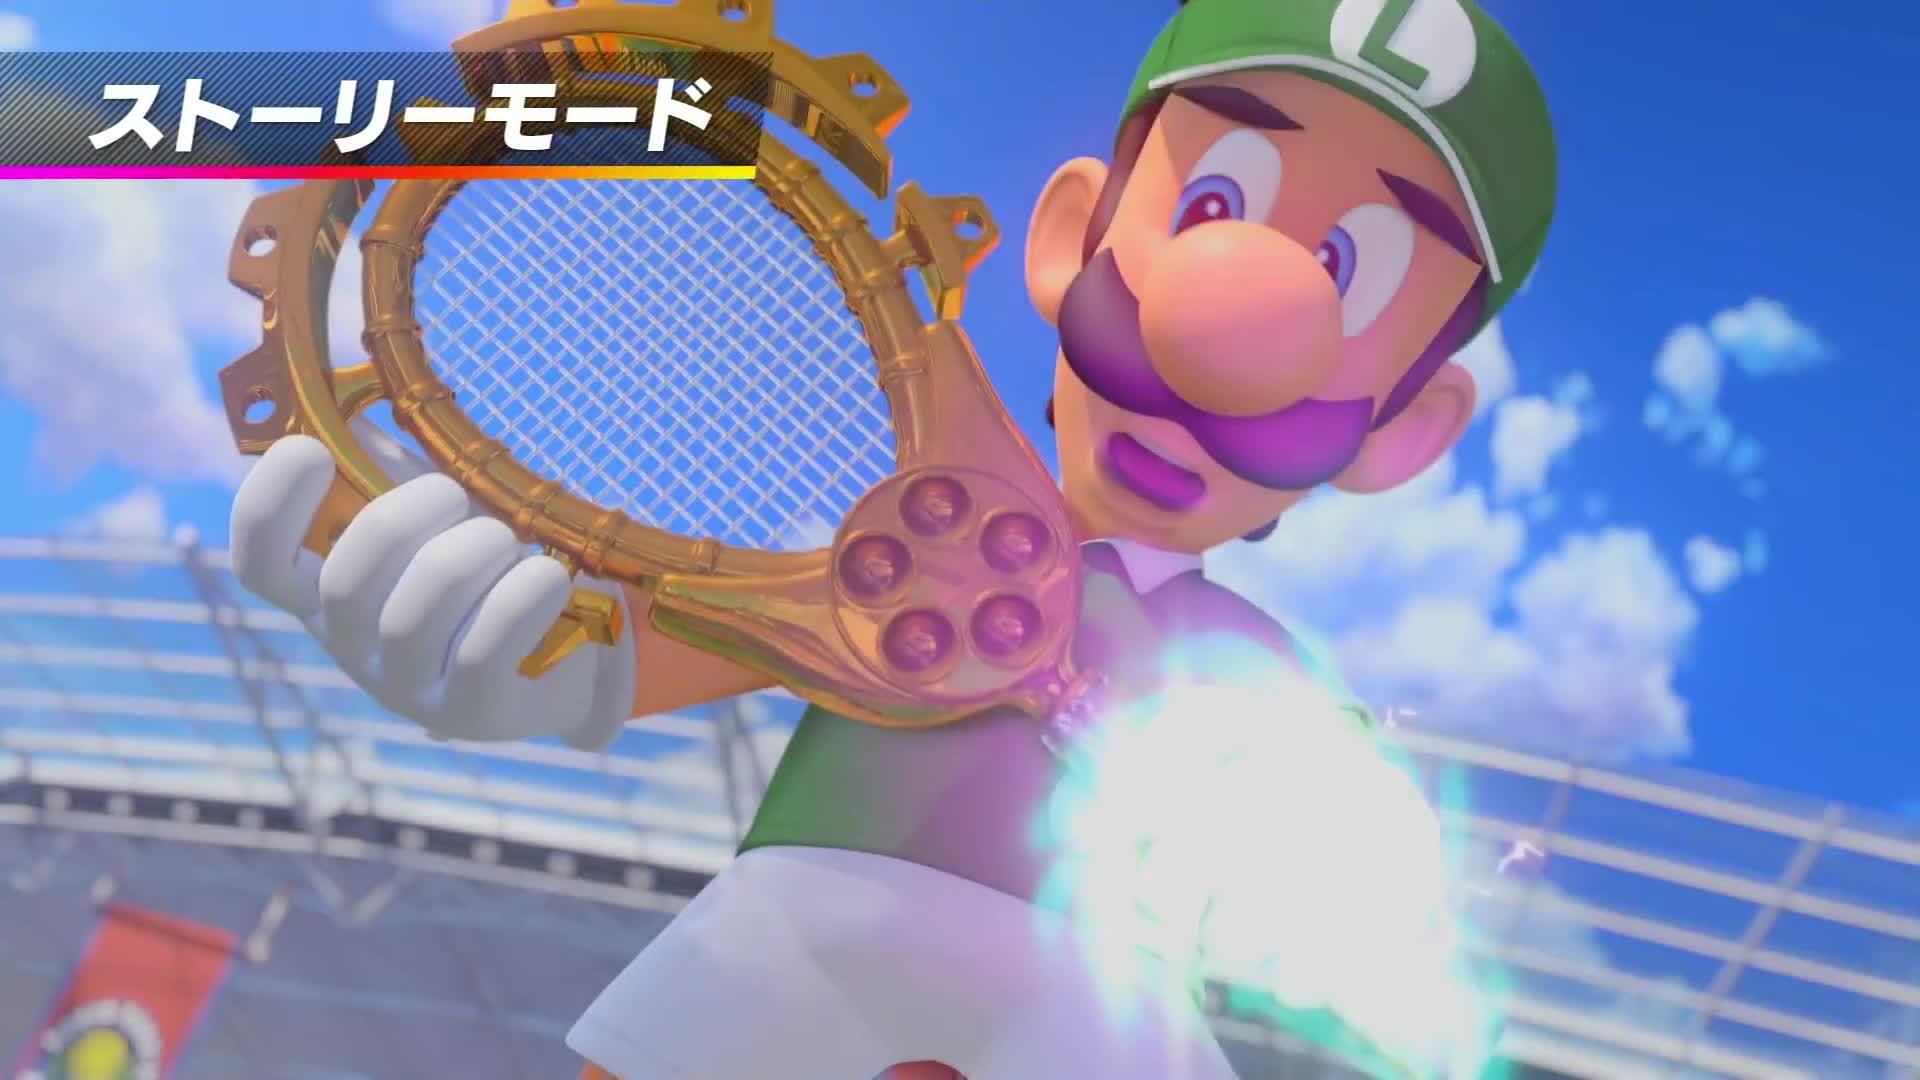 Mario Tennis Aces Overview Trailer New Story Mode Details Dark Luigi Jp G